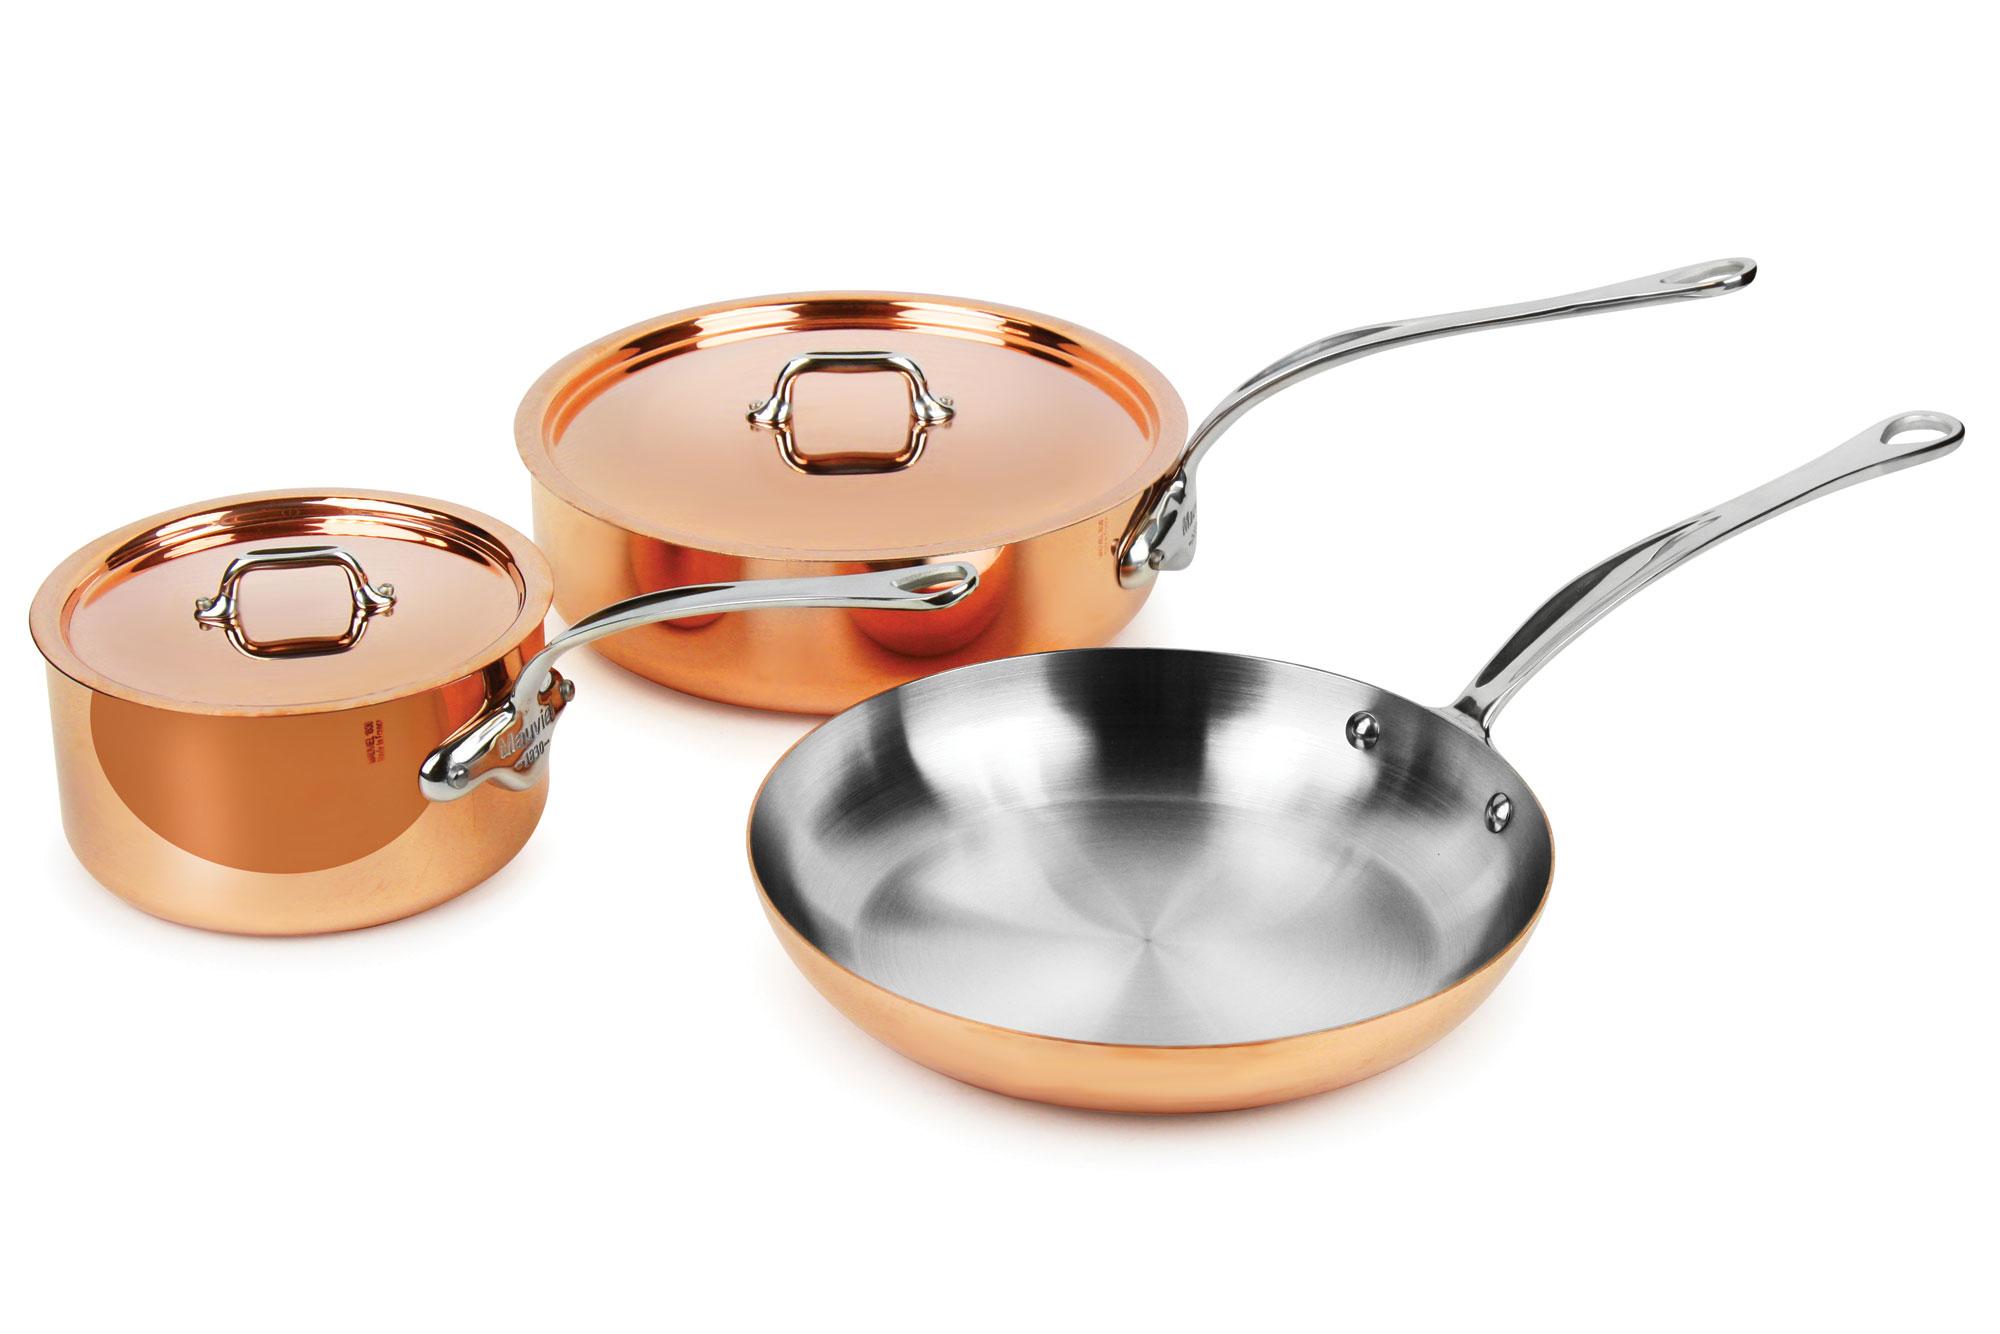 Mauviel M Heritage 150s Copper Cookware Set 5 Piece